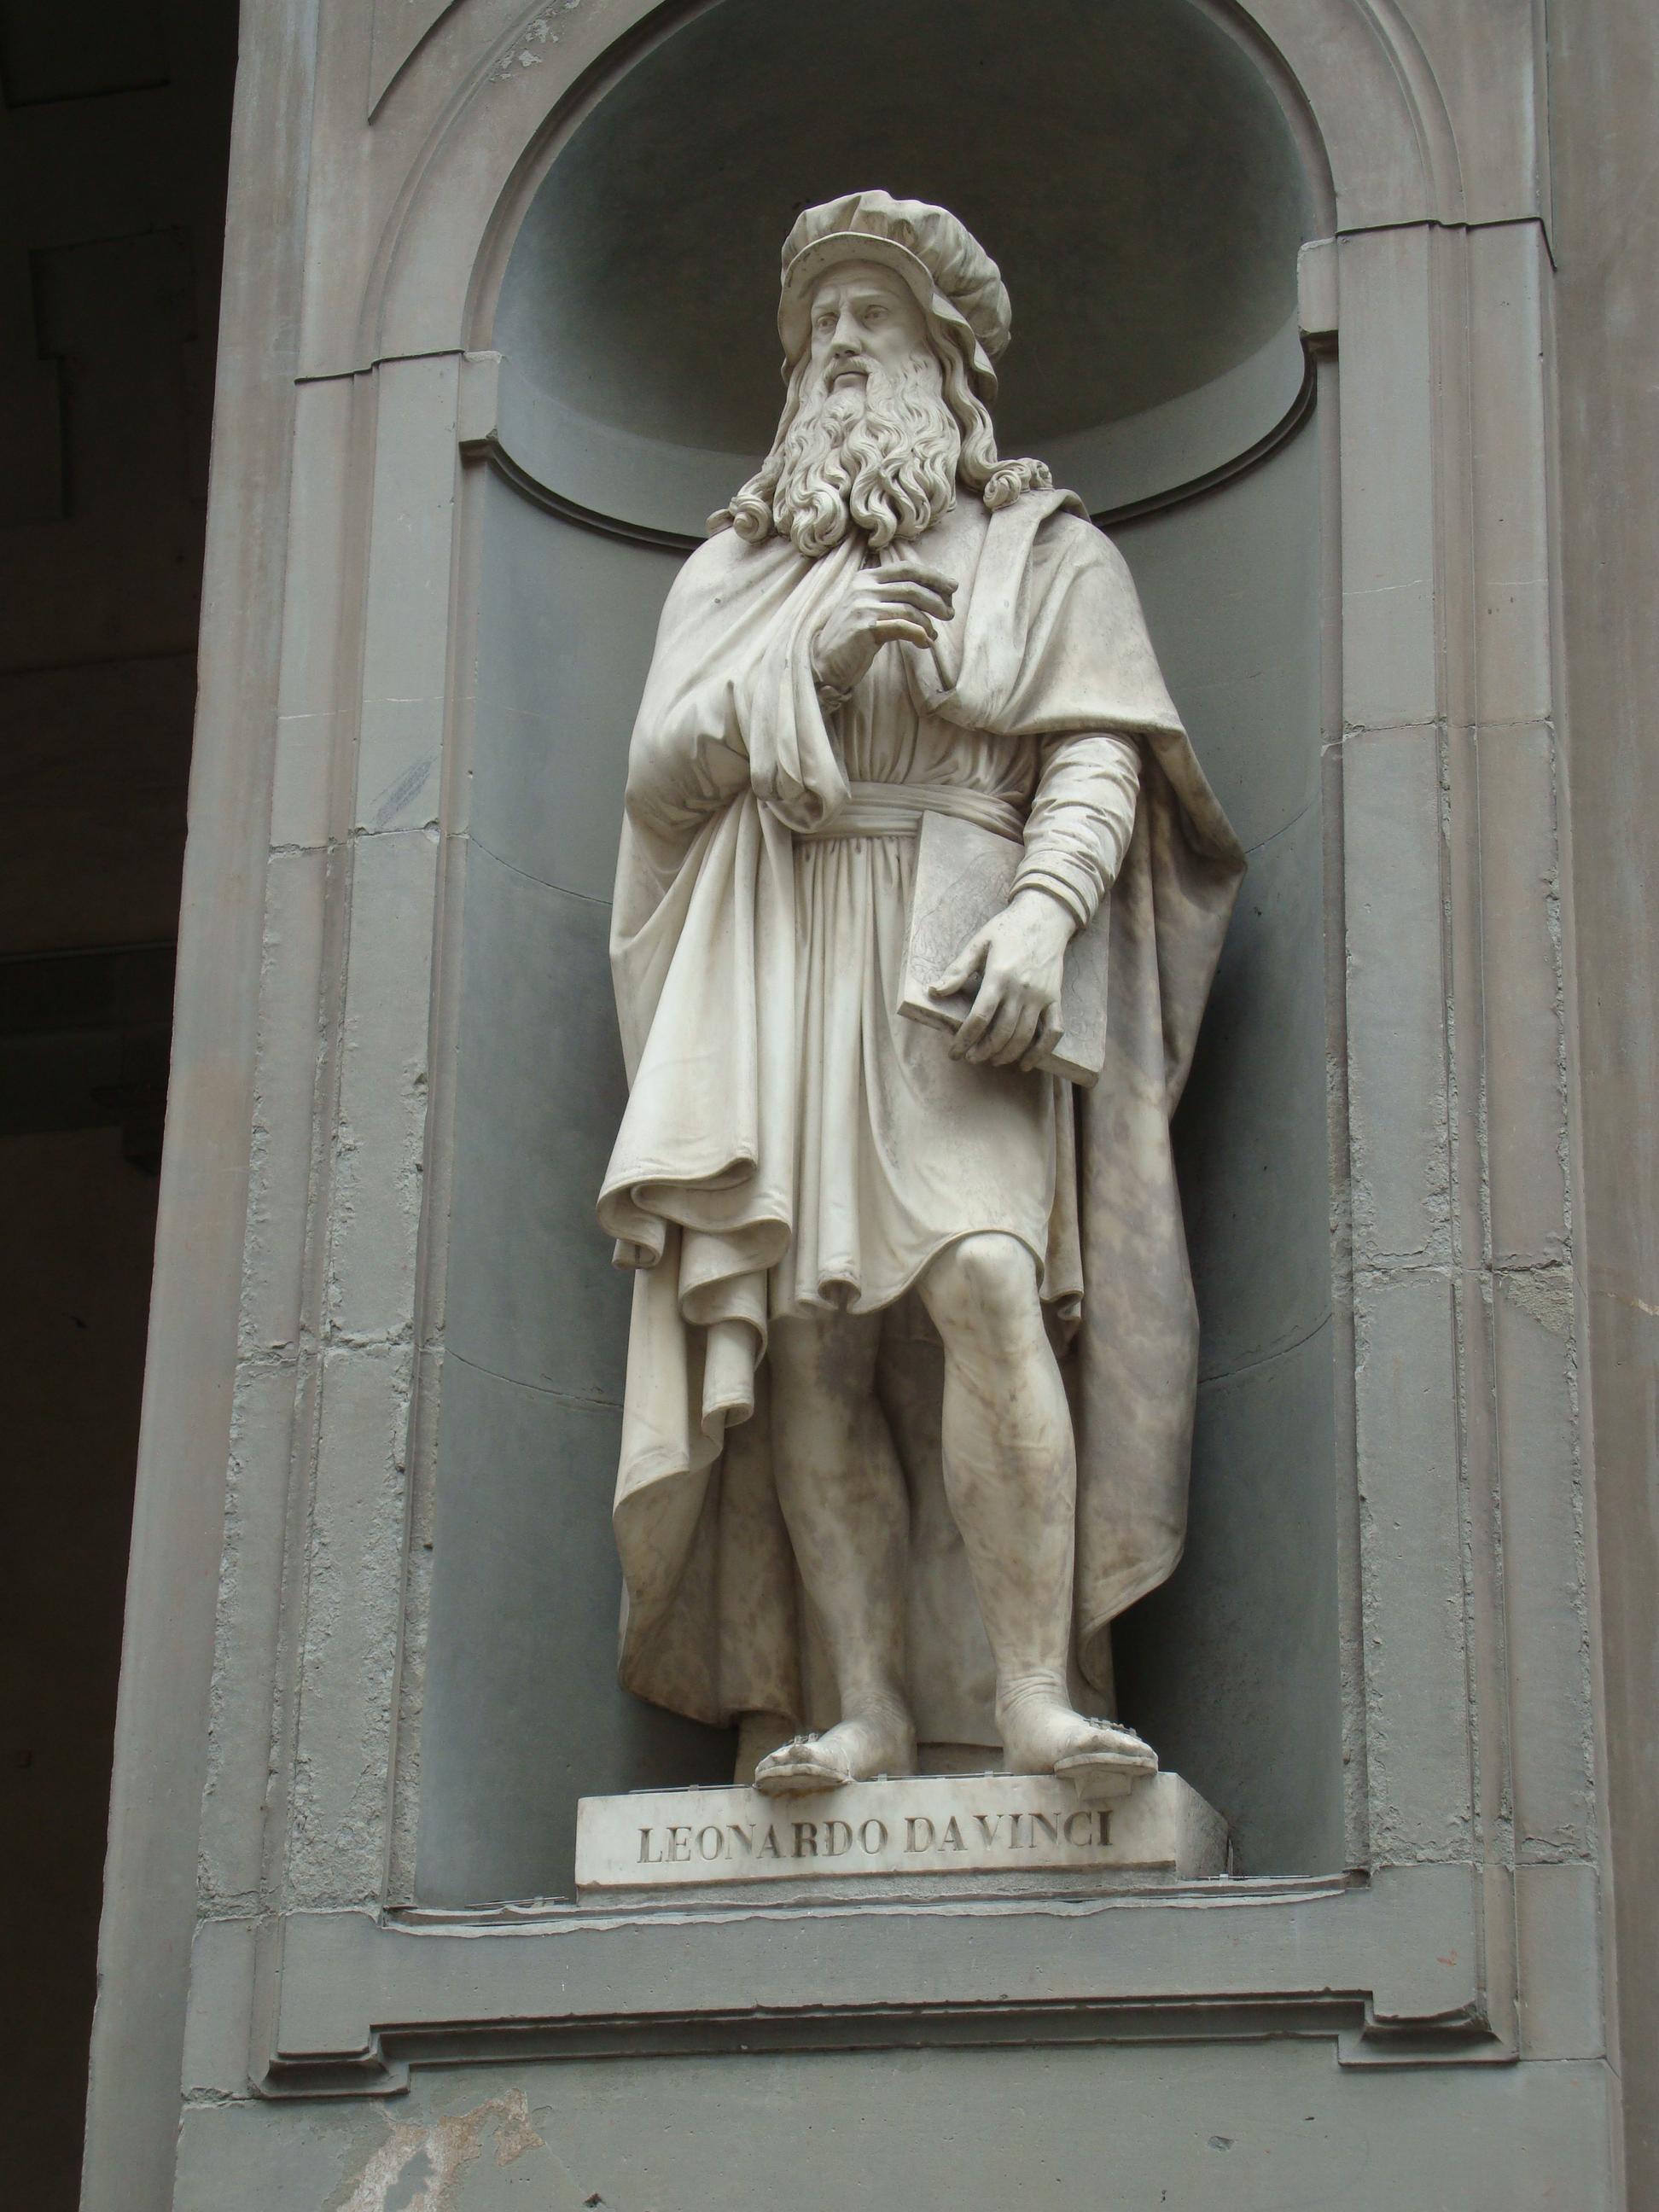 Leonardo Da Vinci, Galleria degli Uffizi, Florença.